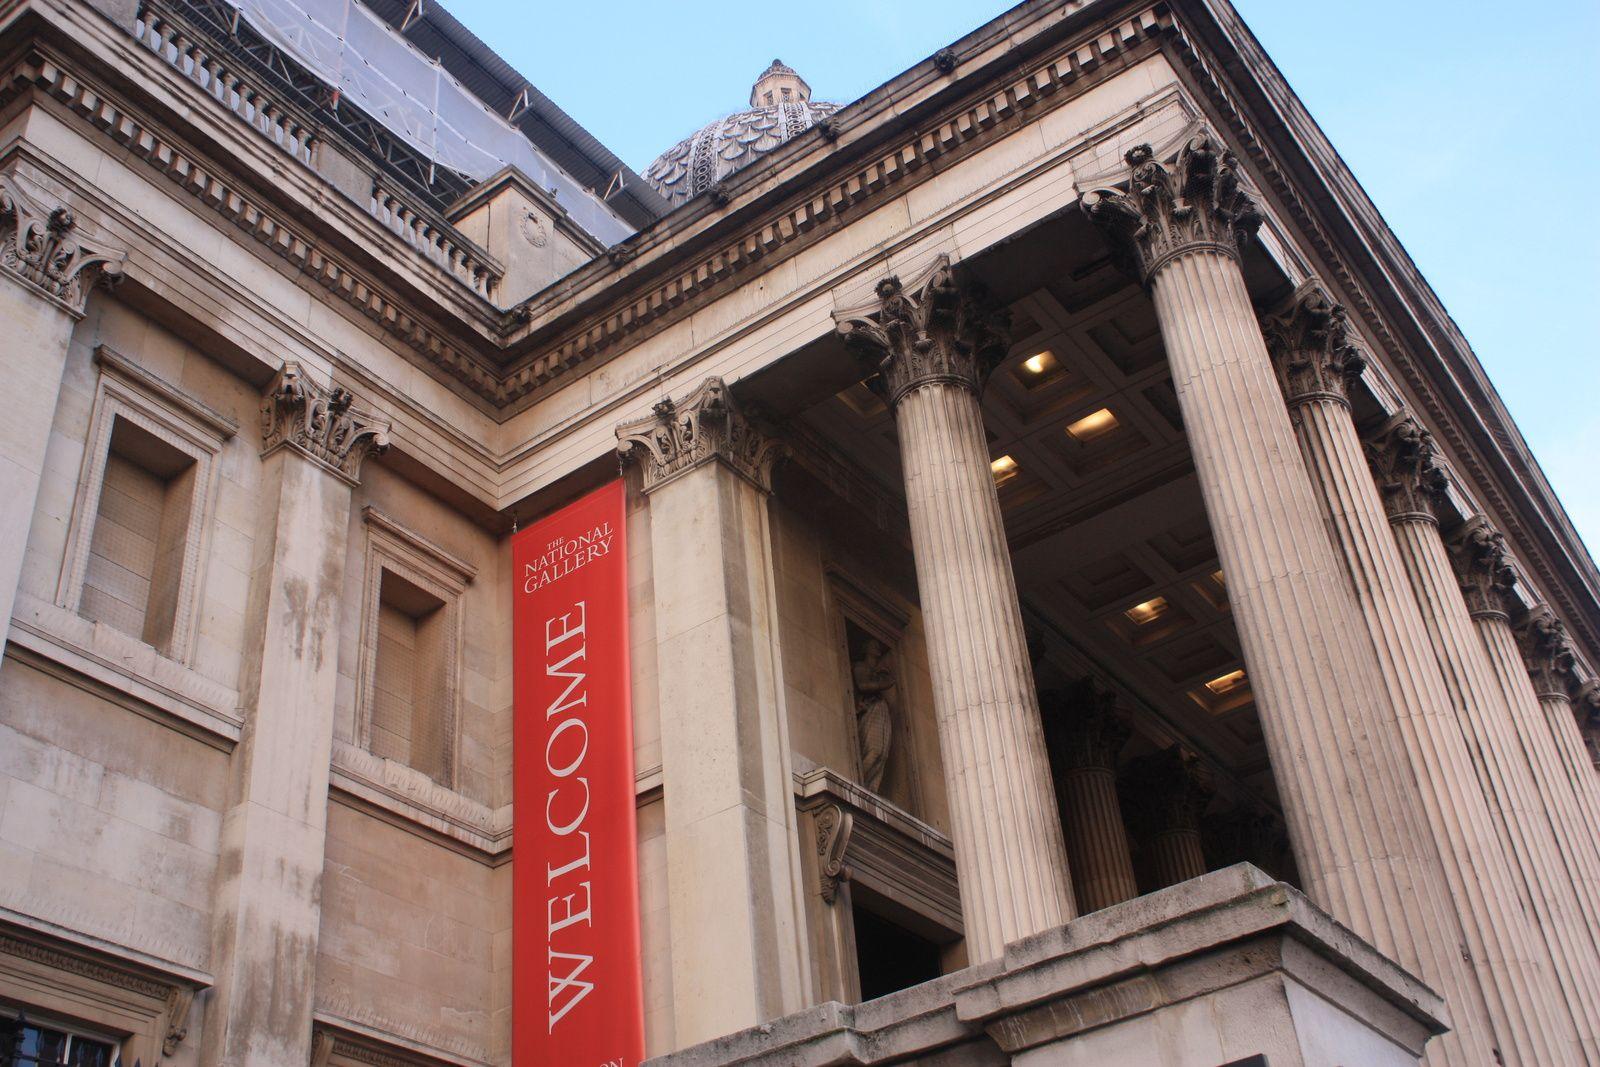 London Eye / Museum of London / The National Gallery / Trafalgar Square